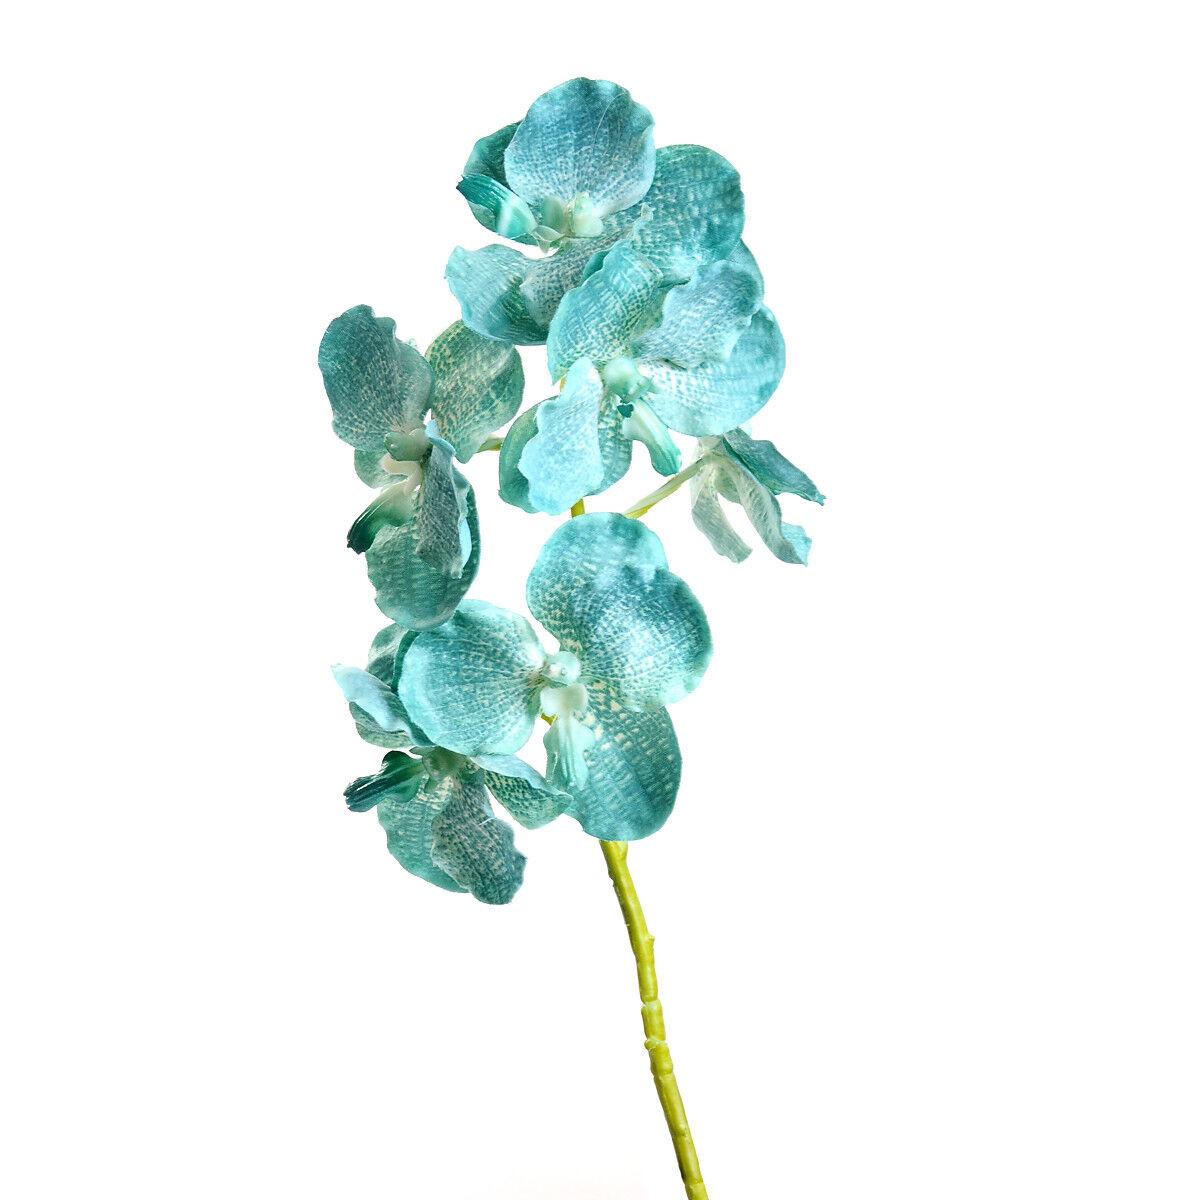 Deko Kamin deko kaminkonsole : Orchidee ca. 30cm, tu00fcrkis - Depot DE